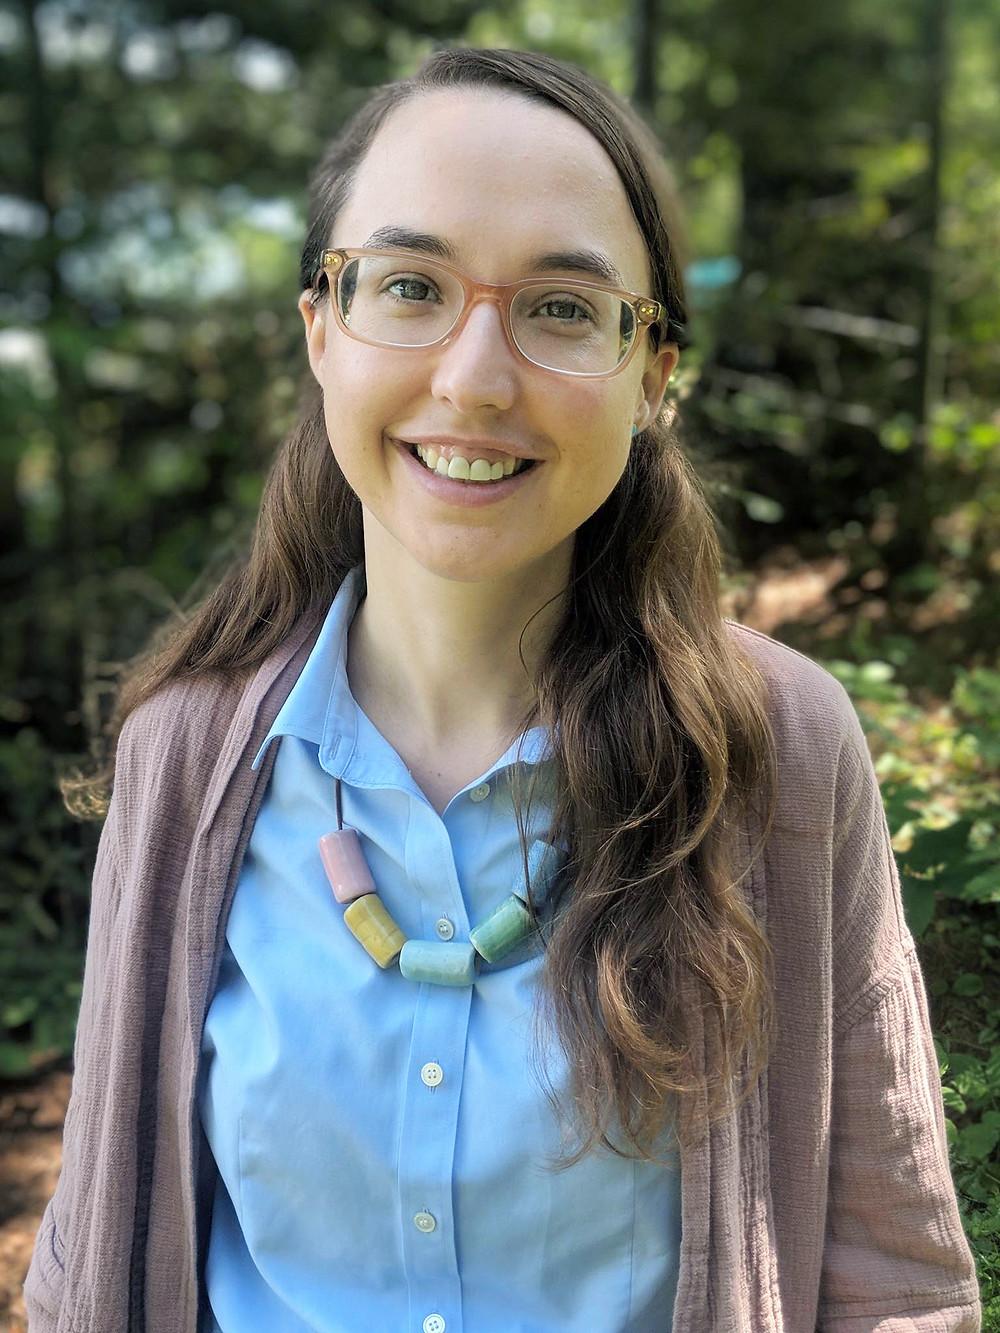 UC Santa Barbara political scientist Leah C. Stokes